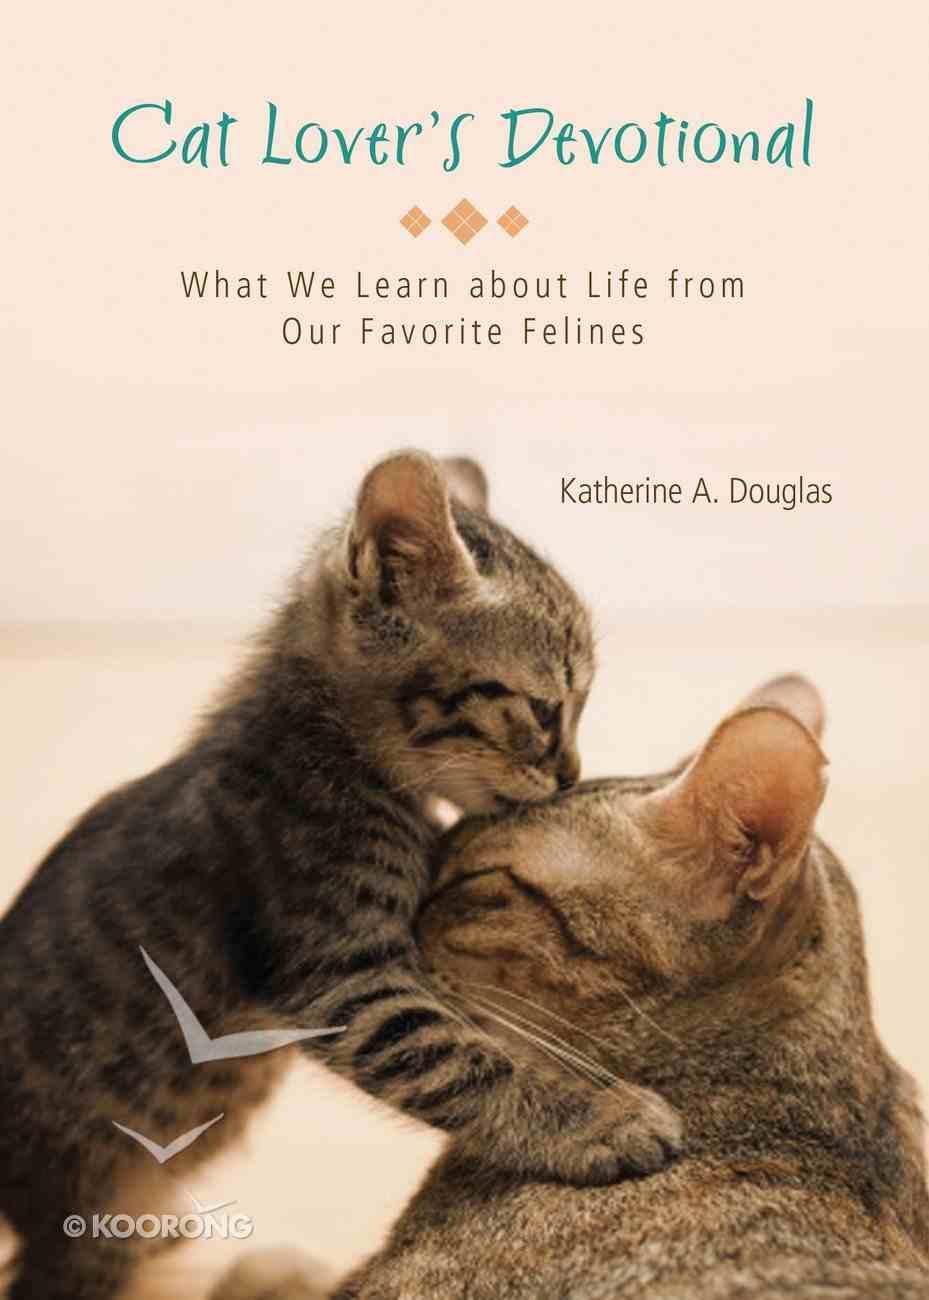 Cat Lover's Devotional eBook